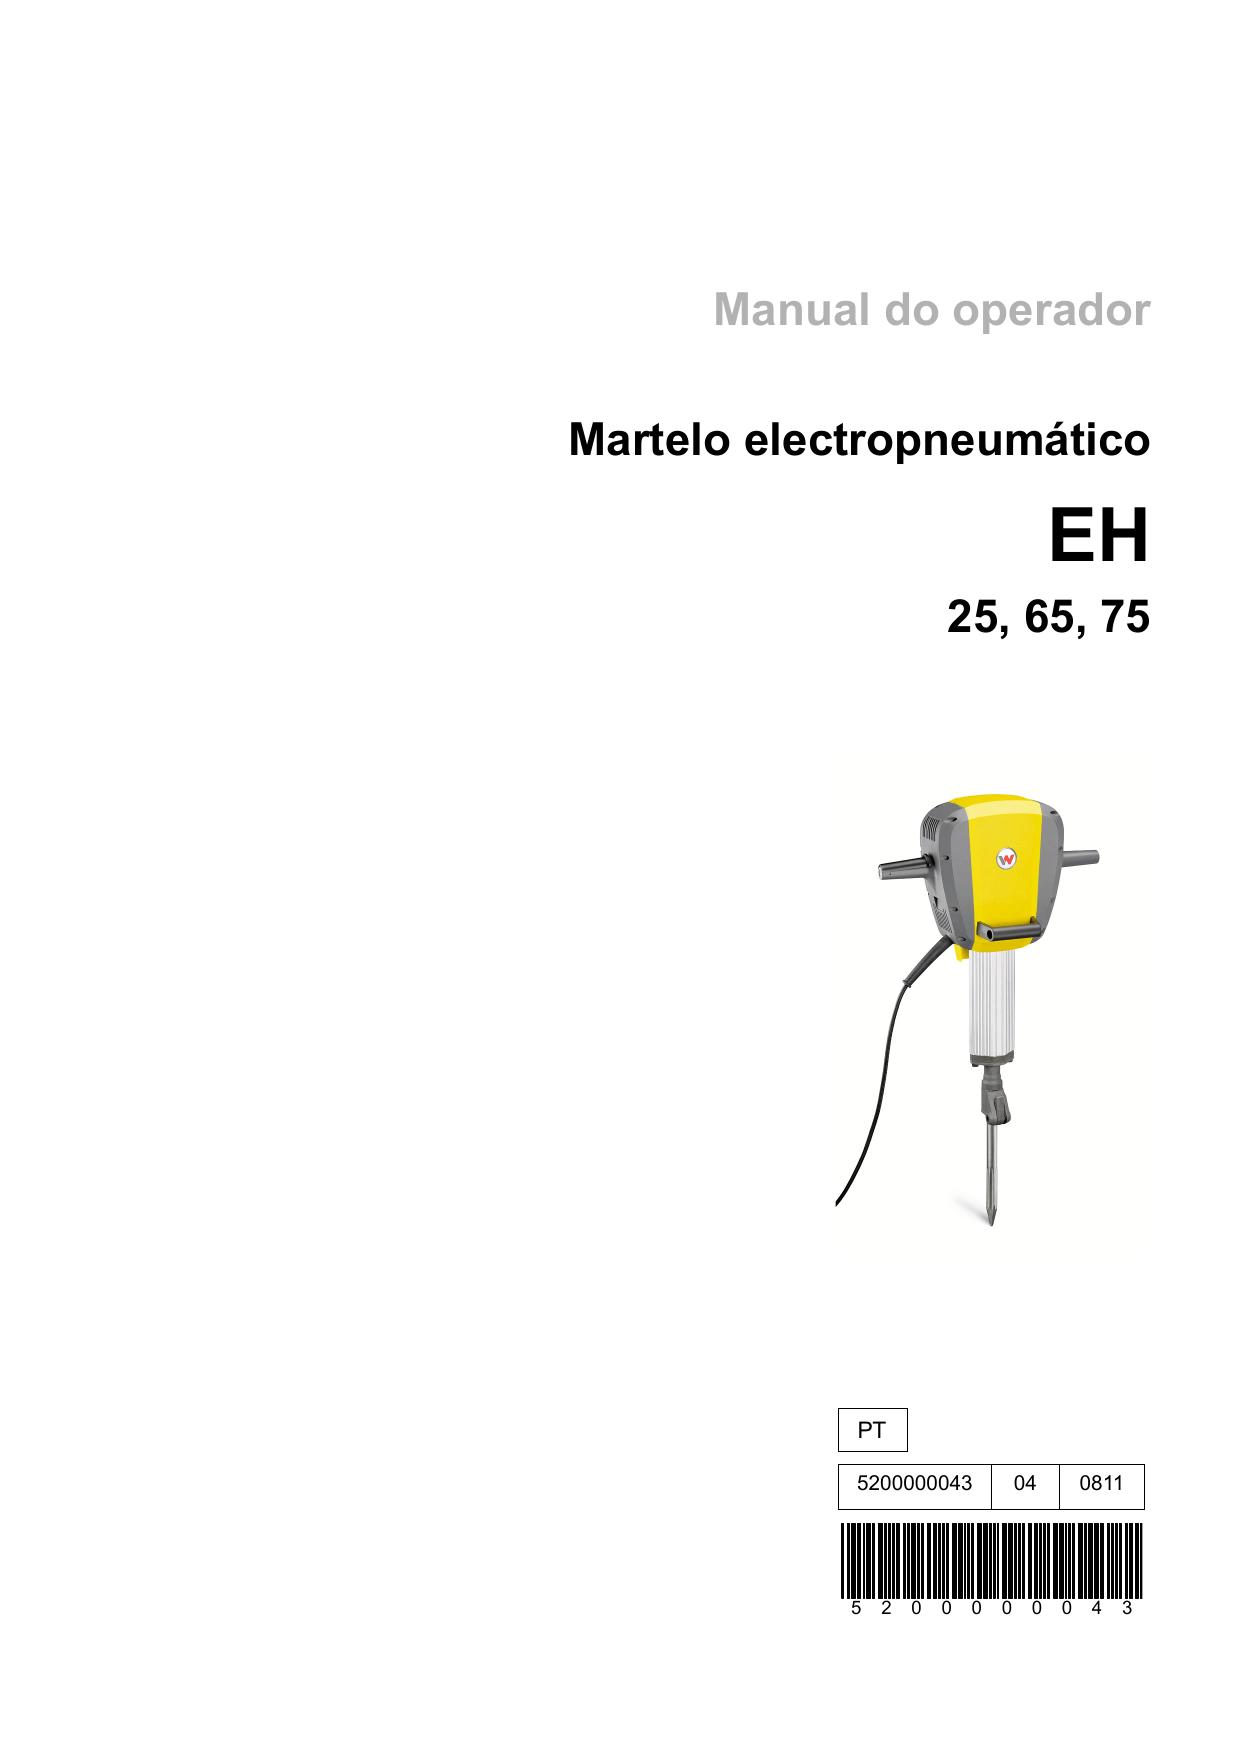 Wacker Neuson EH 75/240V Electric Breaker Manual do